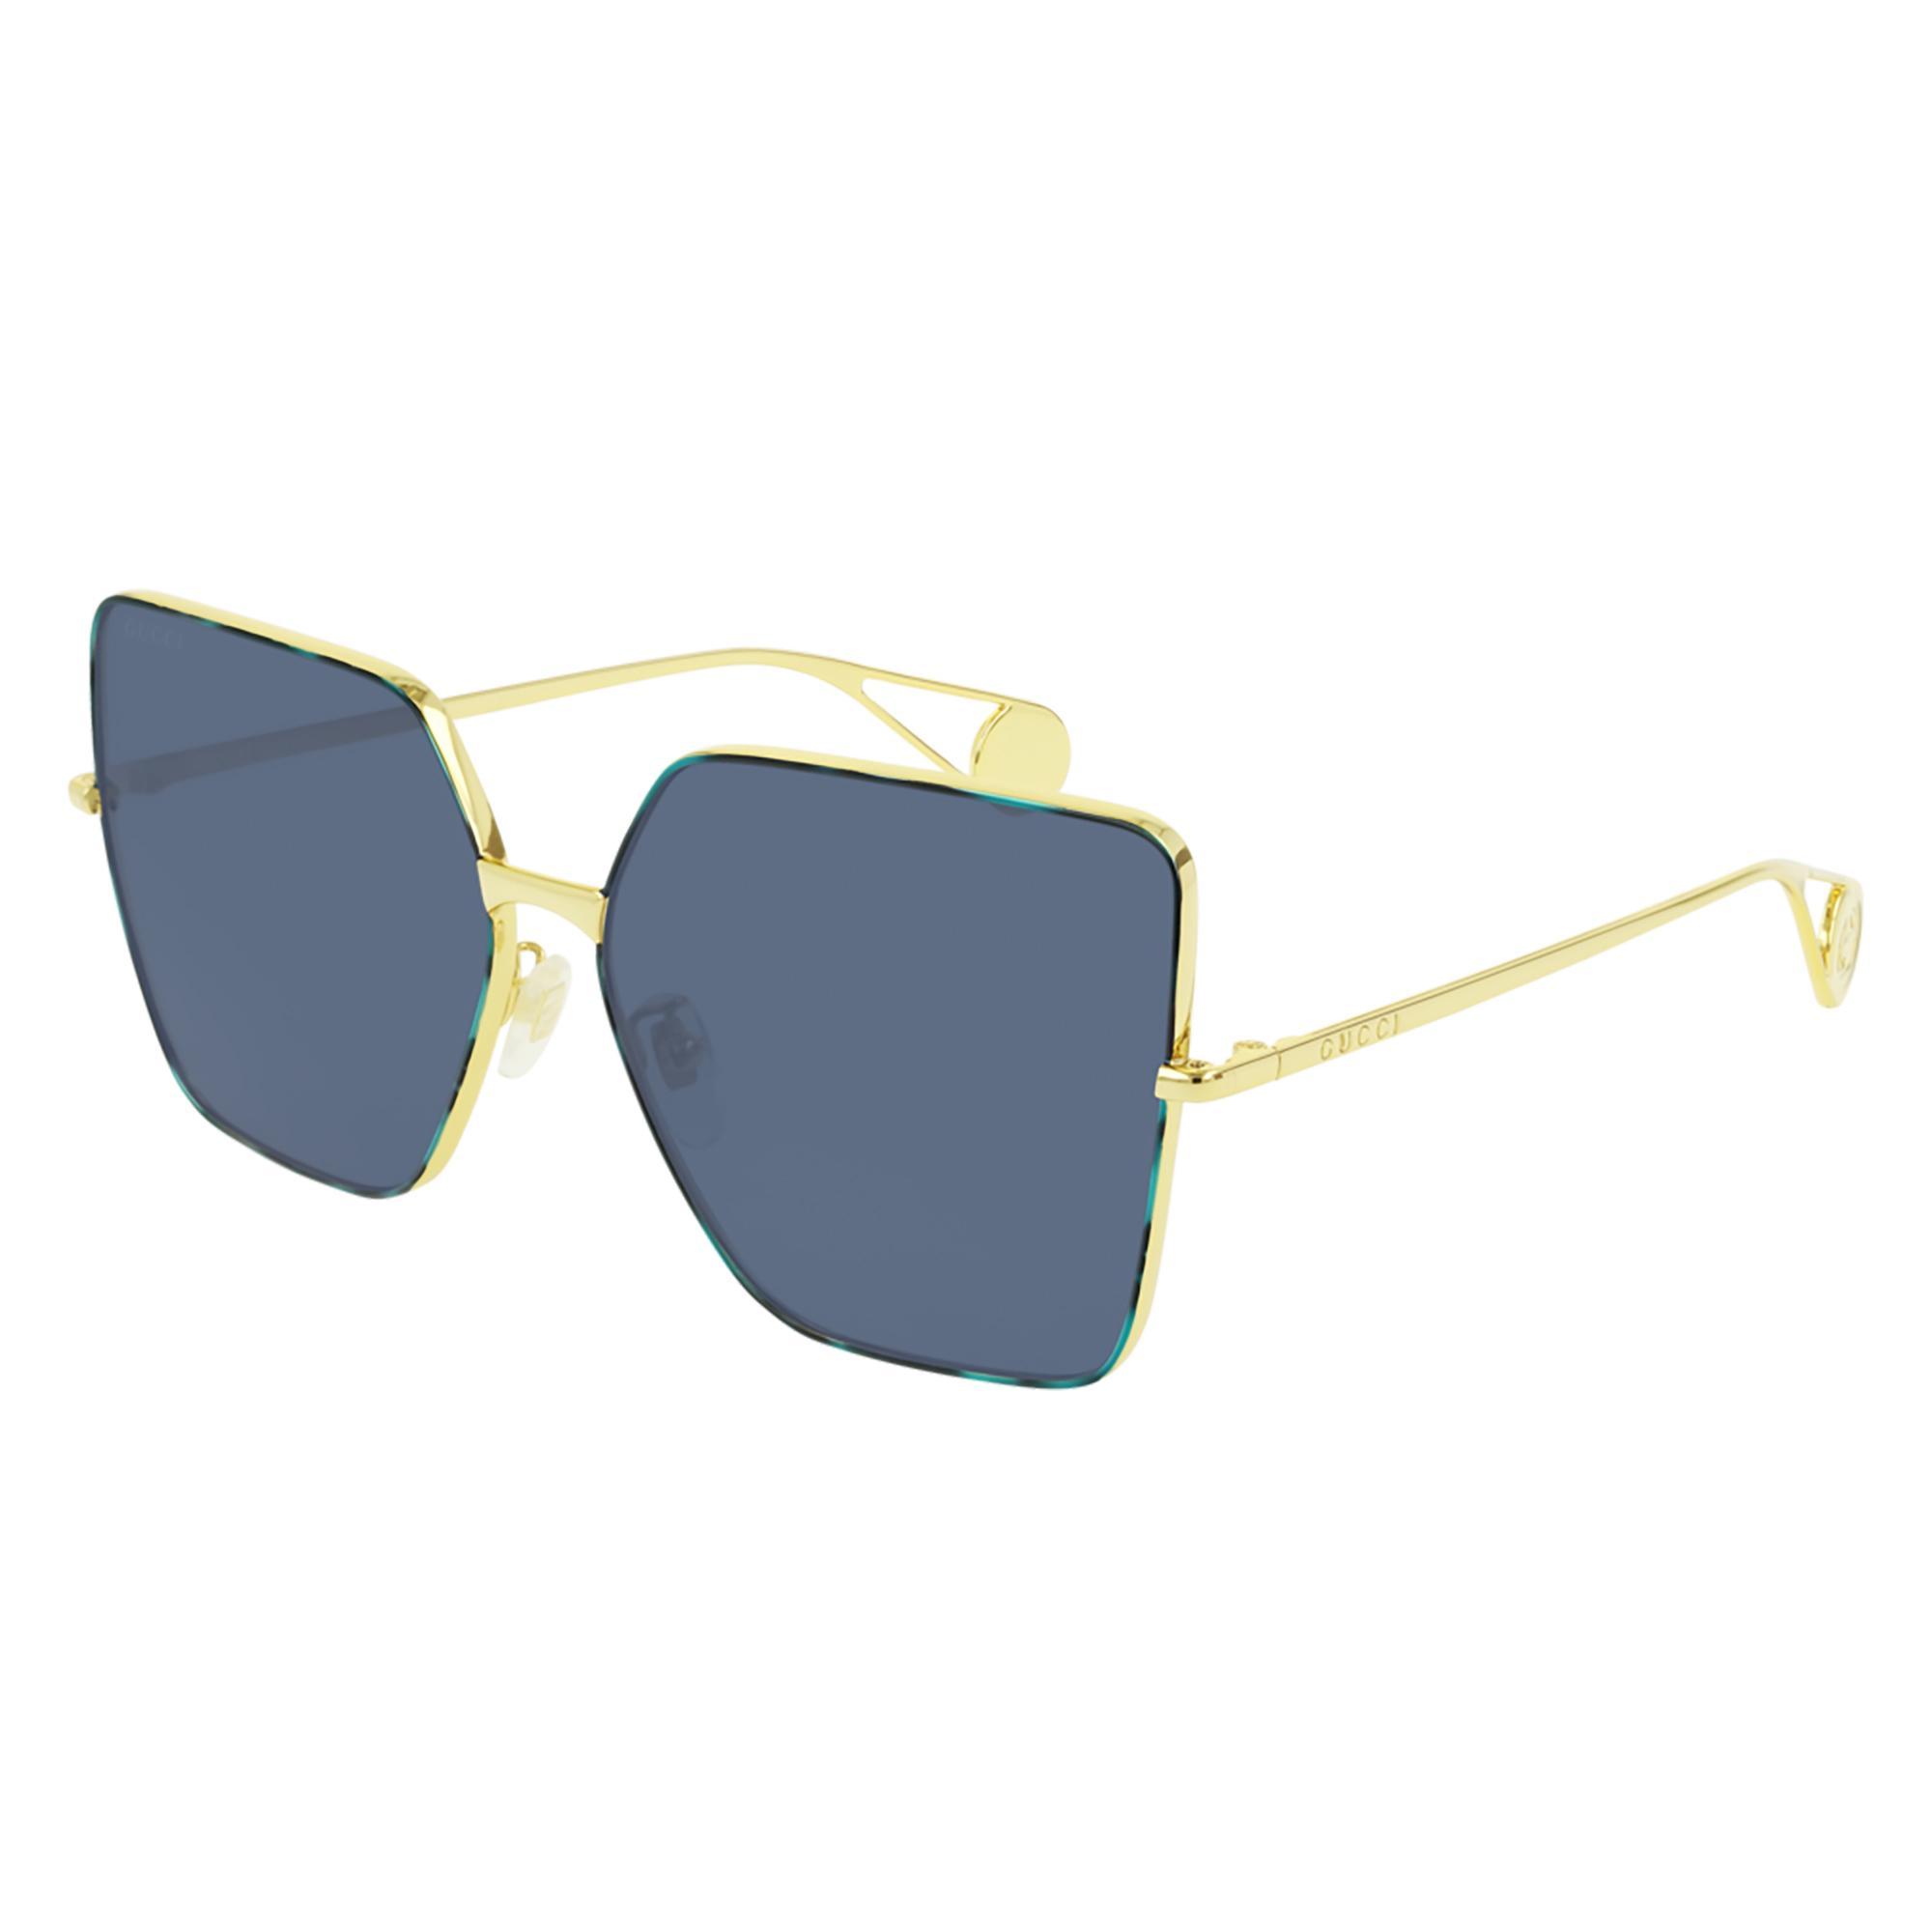 004 gold gold blue